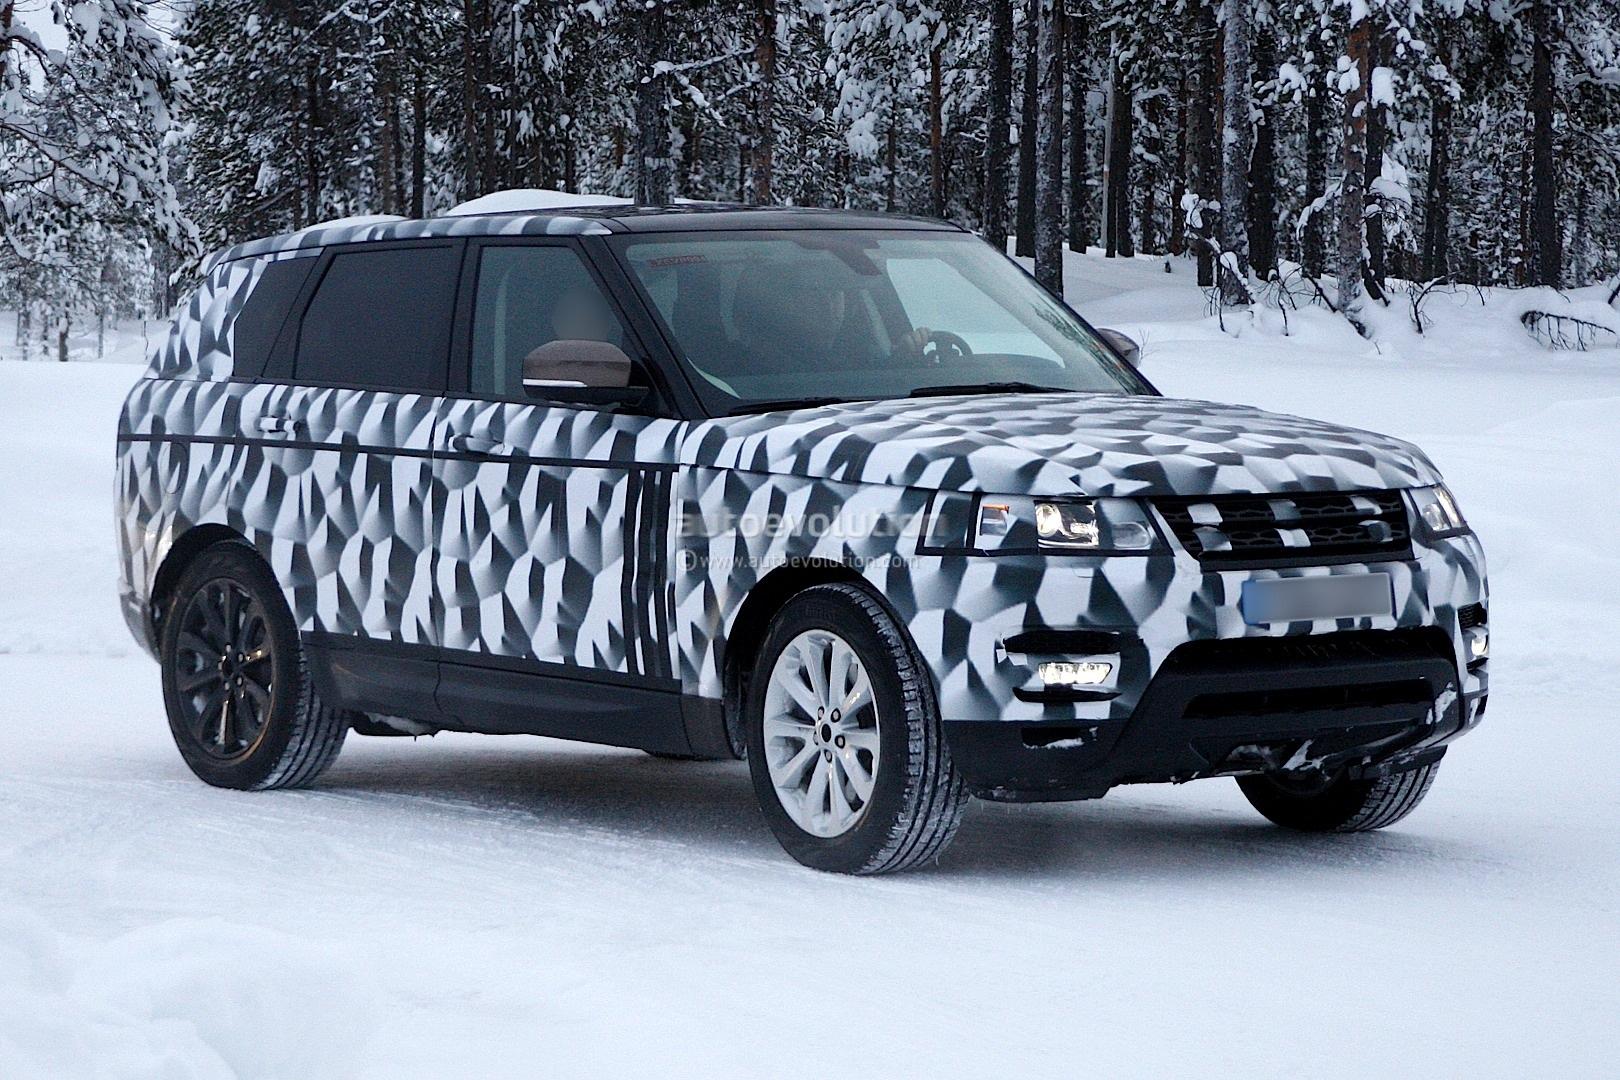 Spyshots 2014 Range Rover Sport Loses Some Camo